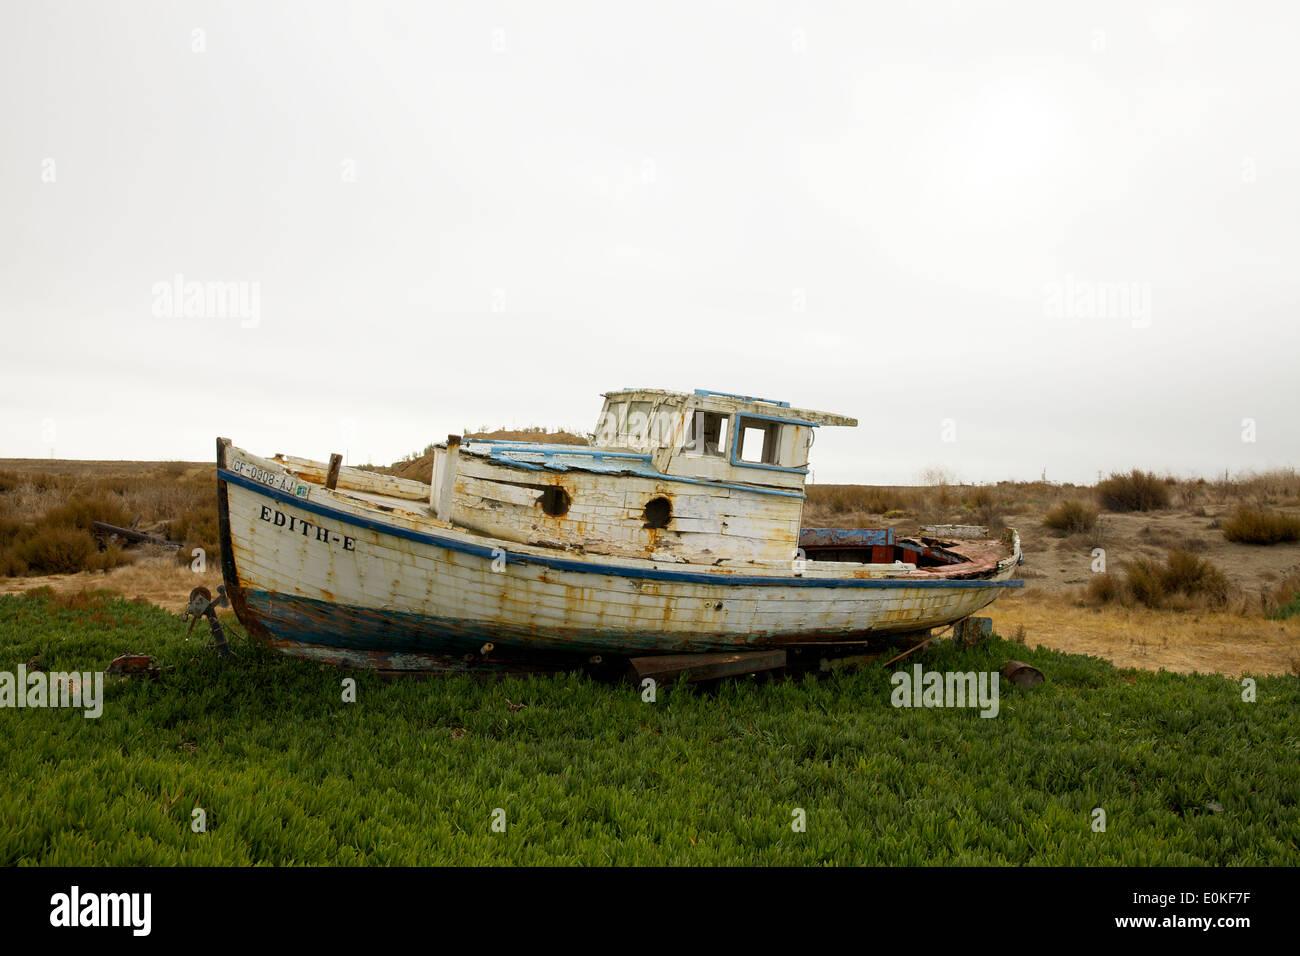 Das Edith-E, sitzt ein Boot an Land in Port Sonoma Marina in Petaluma, Kalifornien. Stockbild